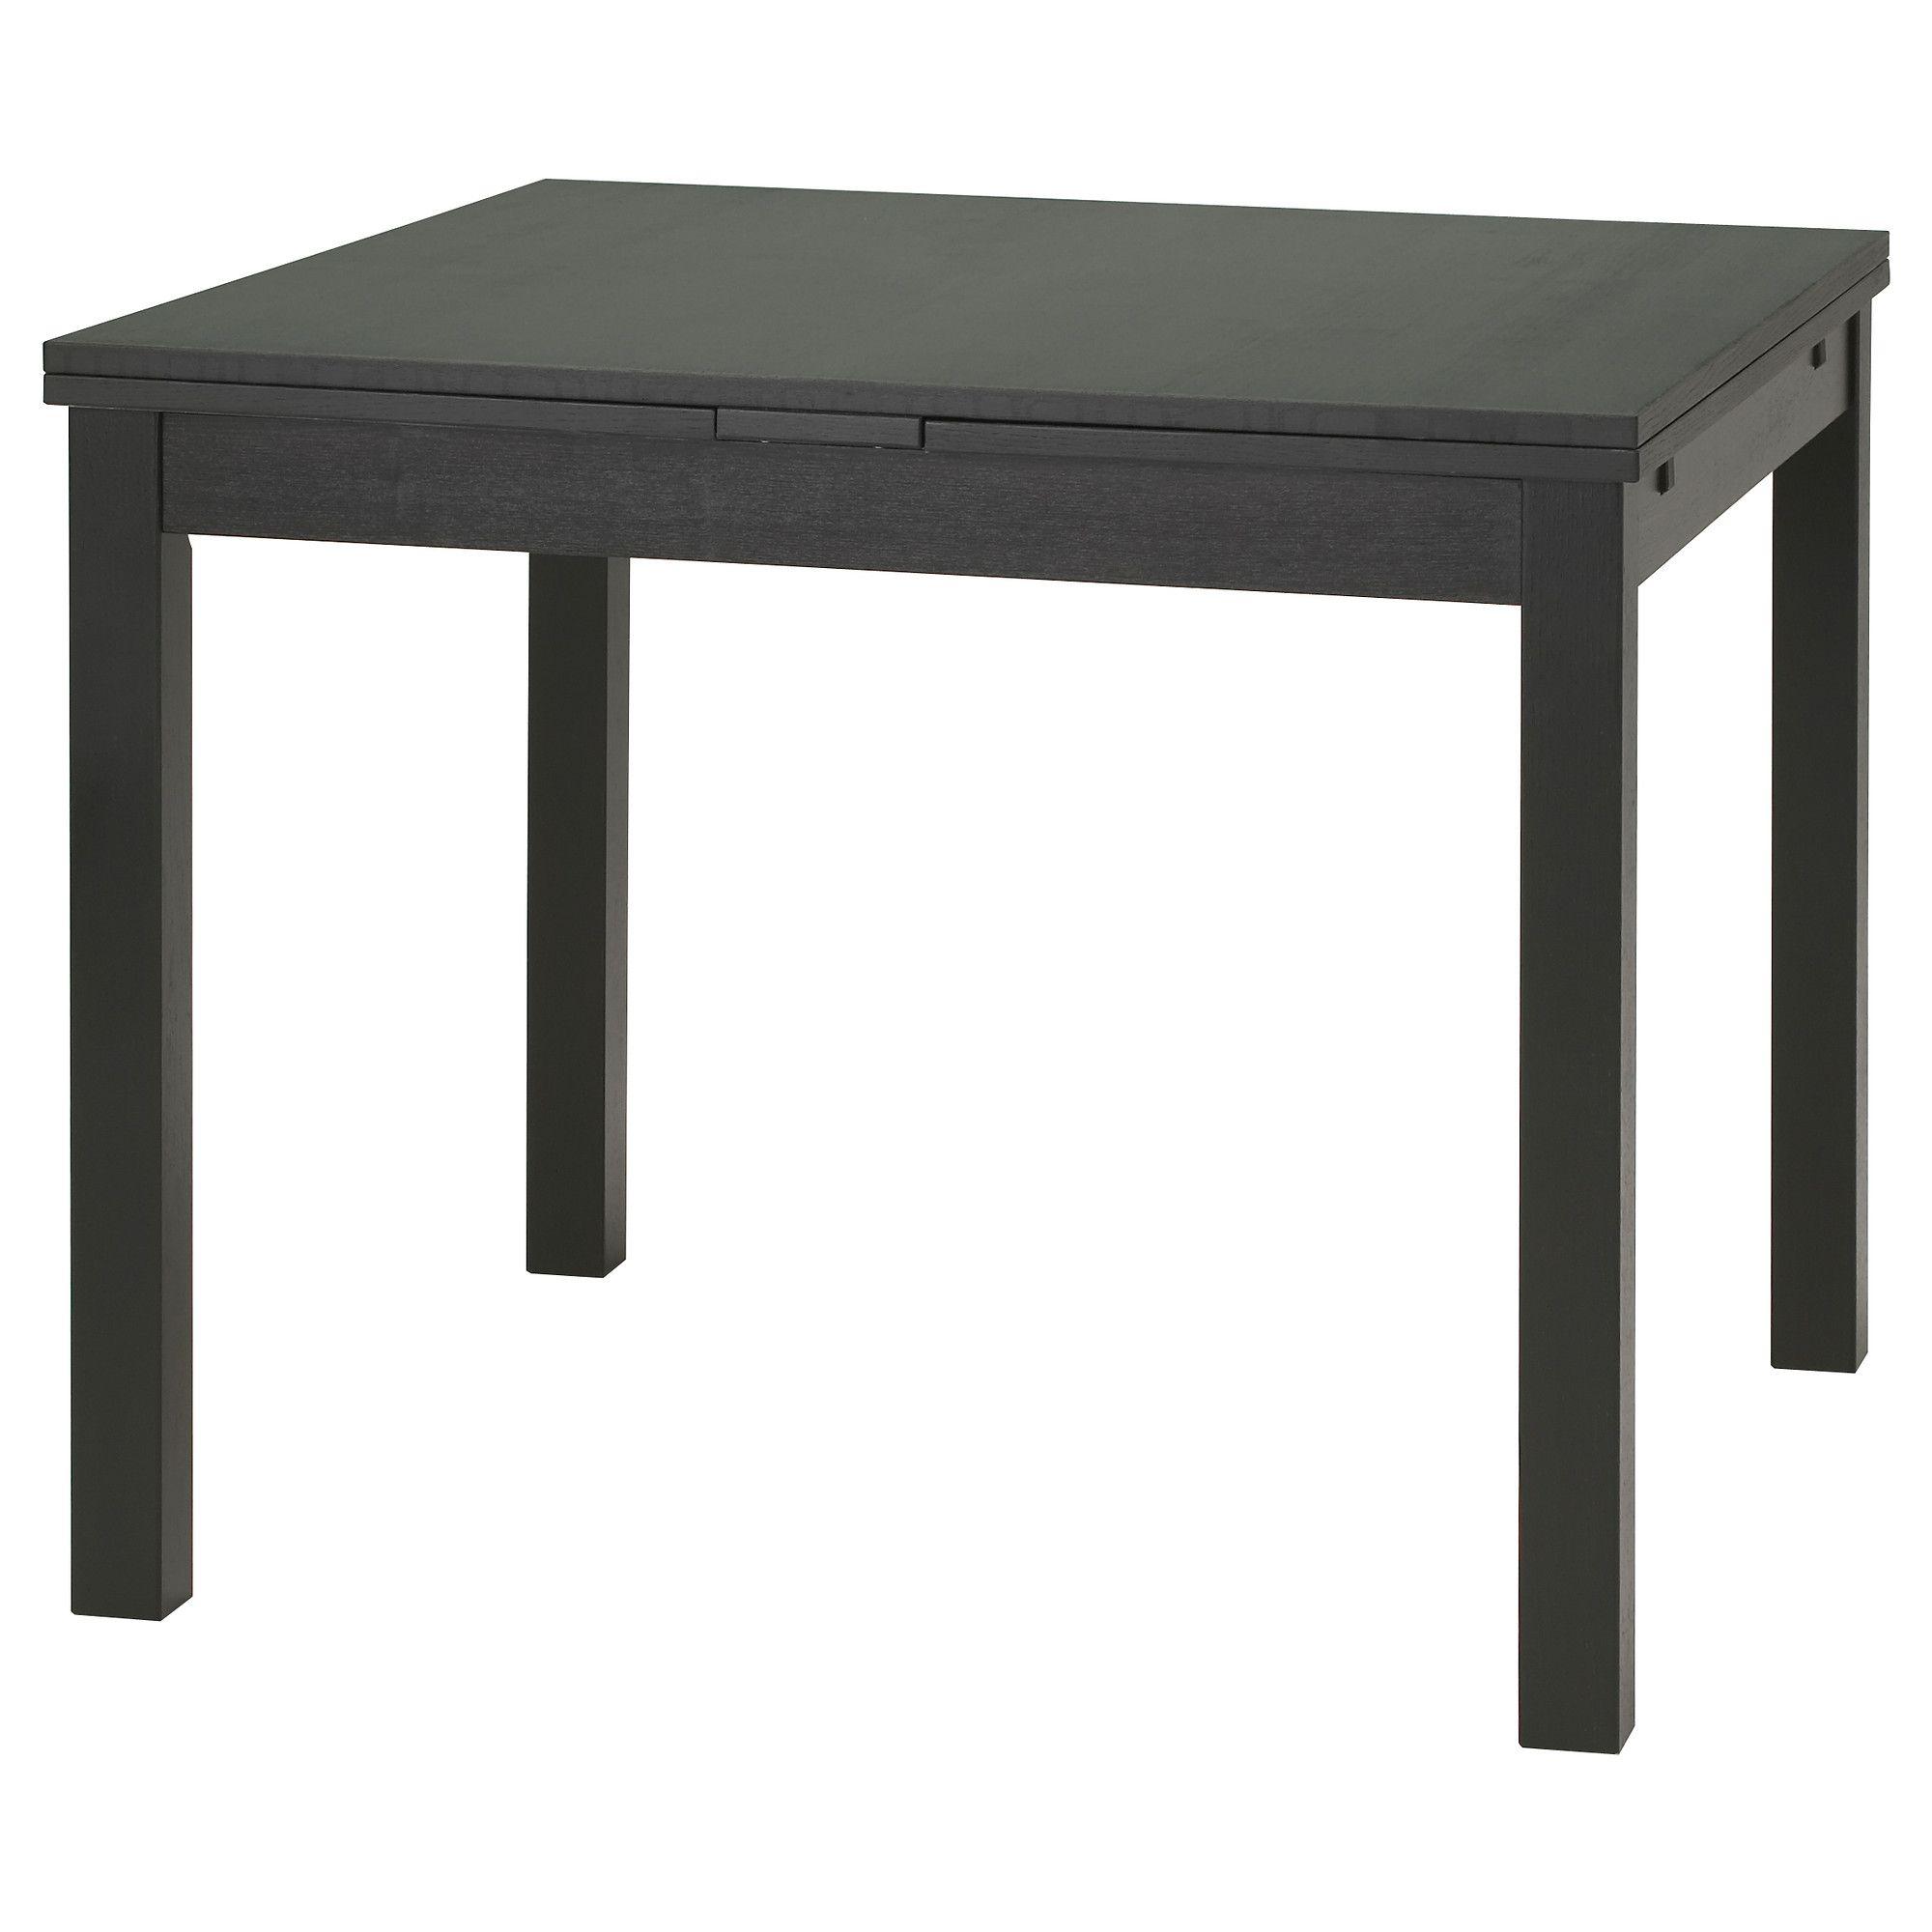 BJURSTA Dining table - brown-black - IKEA- can adjust to get bigger ...